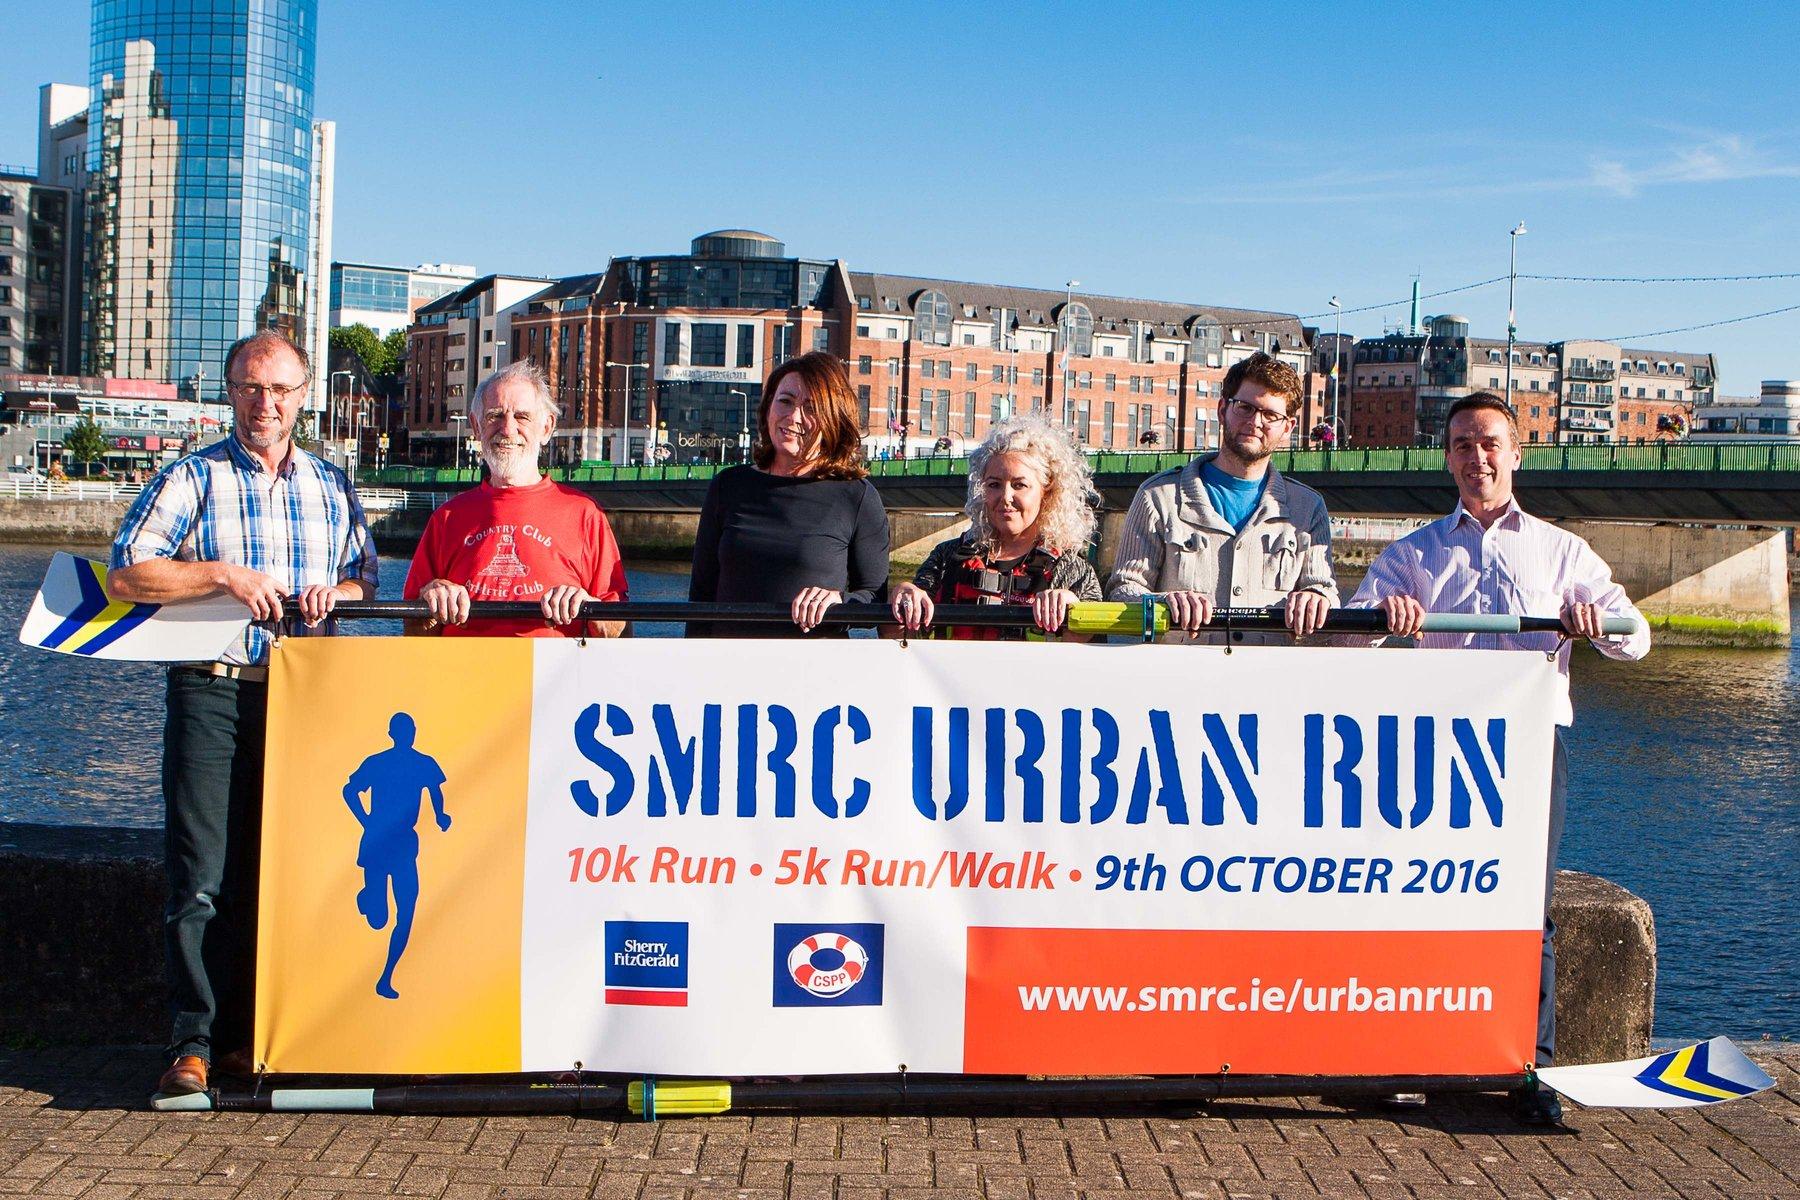 Urban Run 2016